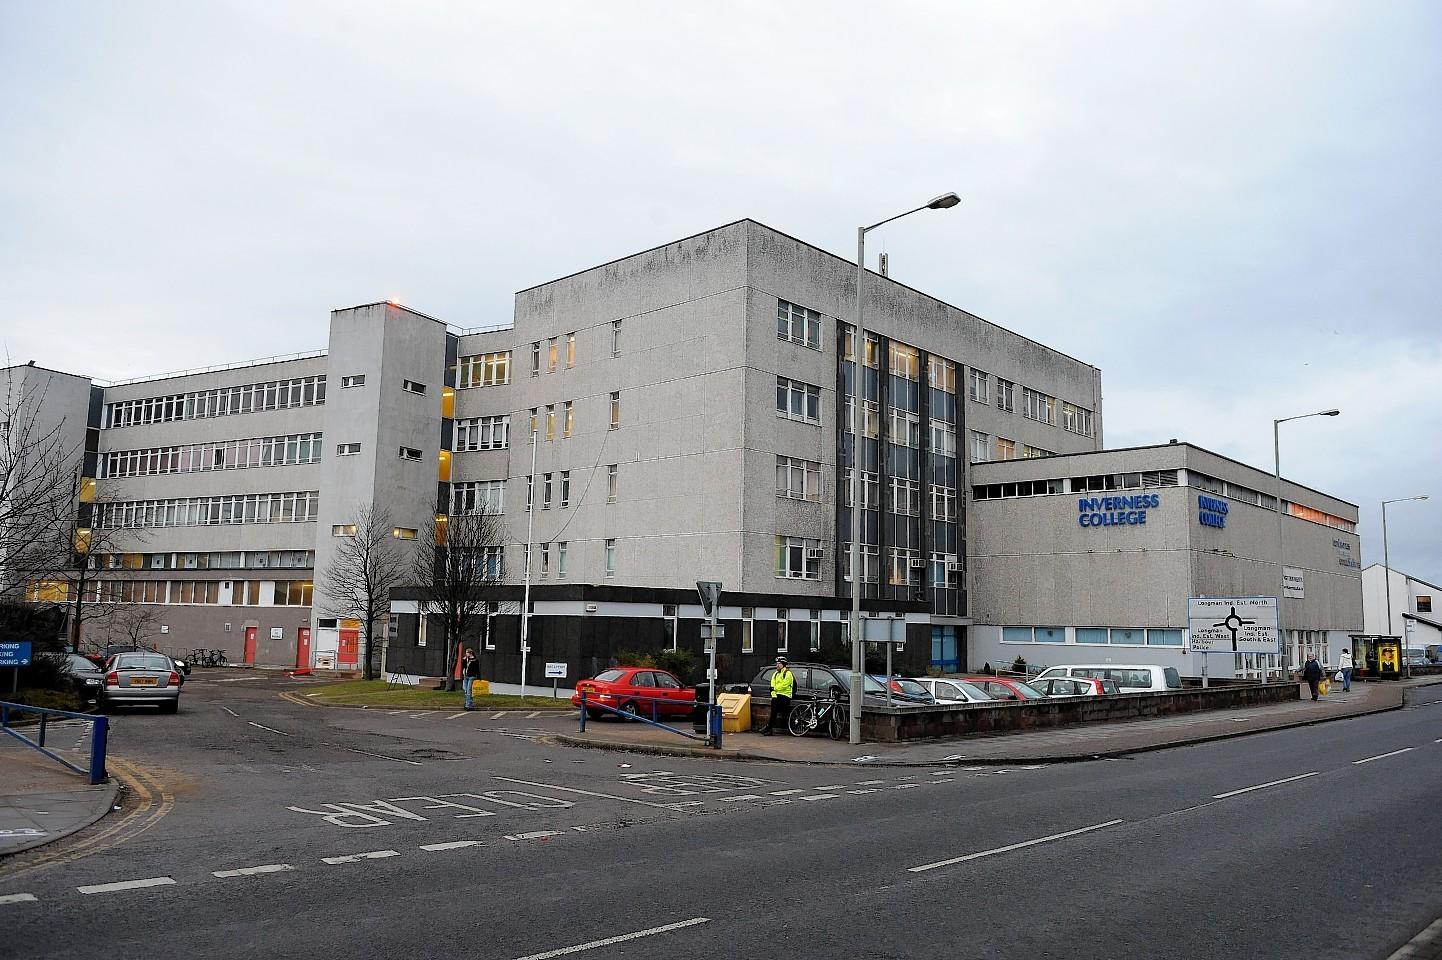 Inverness College.